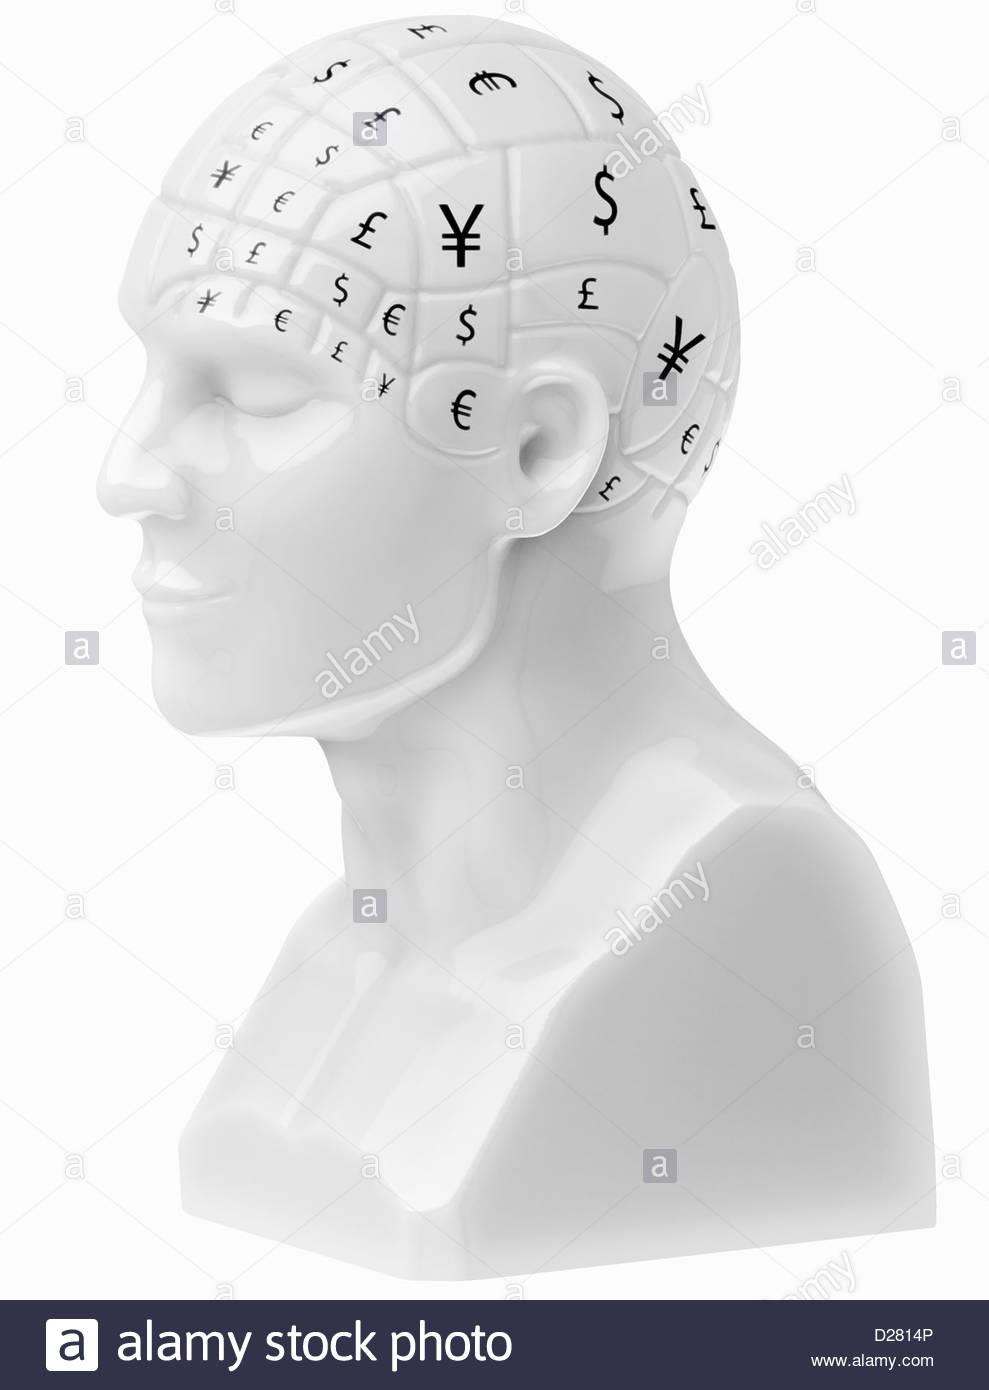 Símbolos de Moeda cobrindo cérebro busto Imagens de Stock